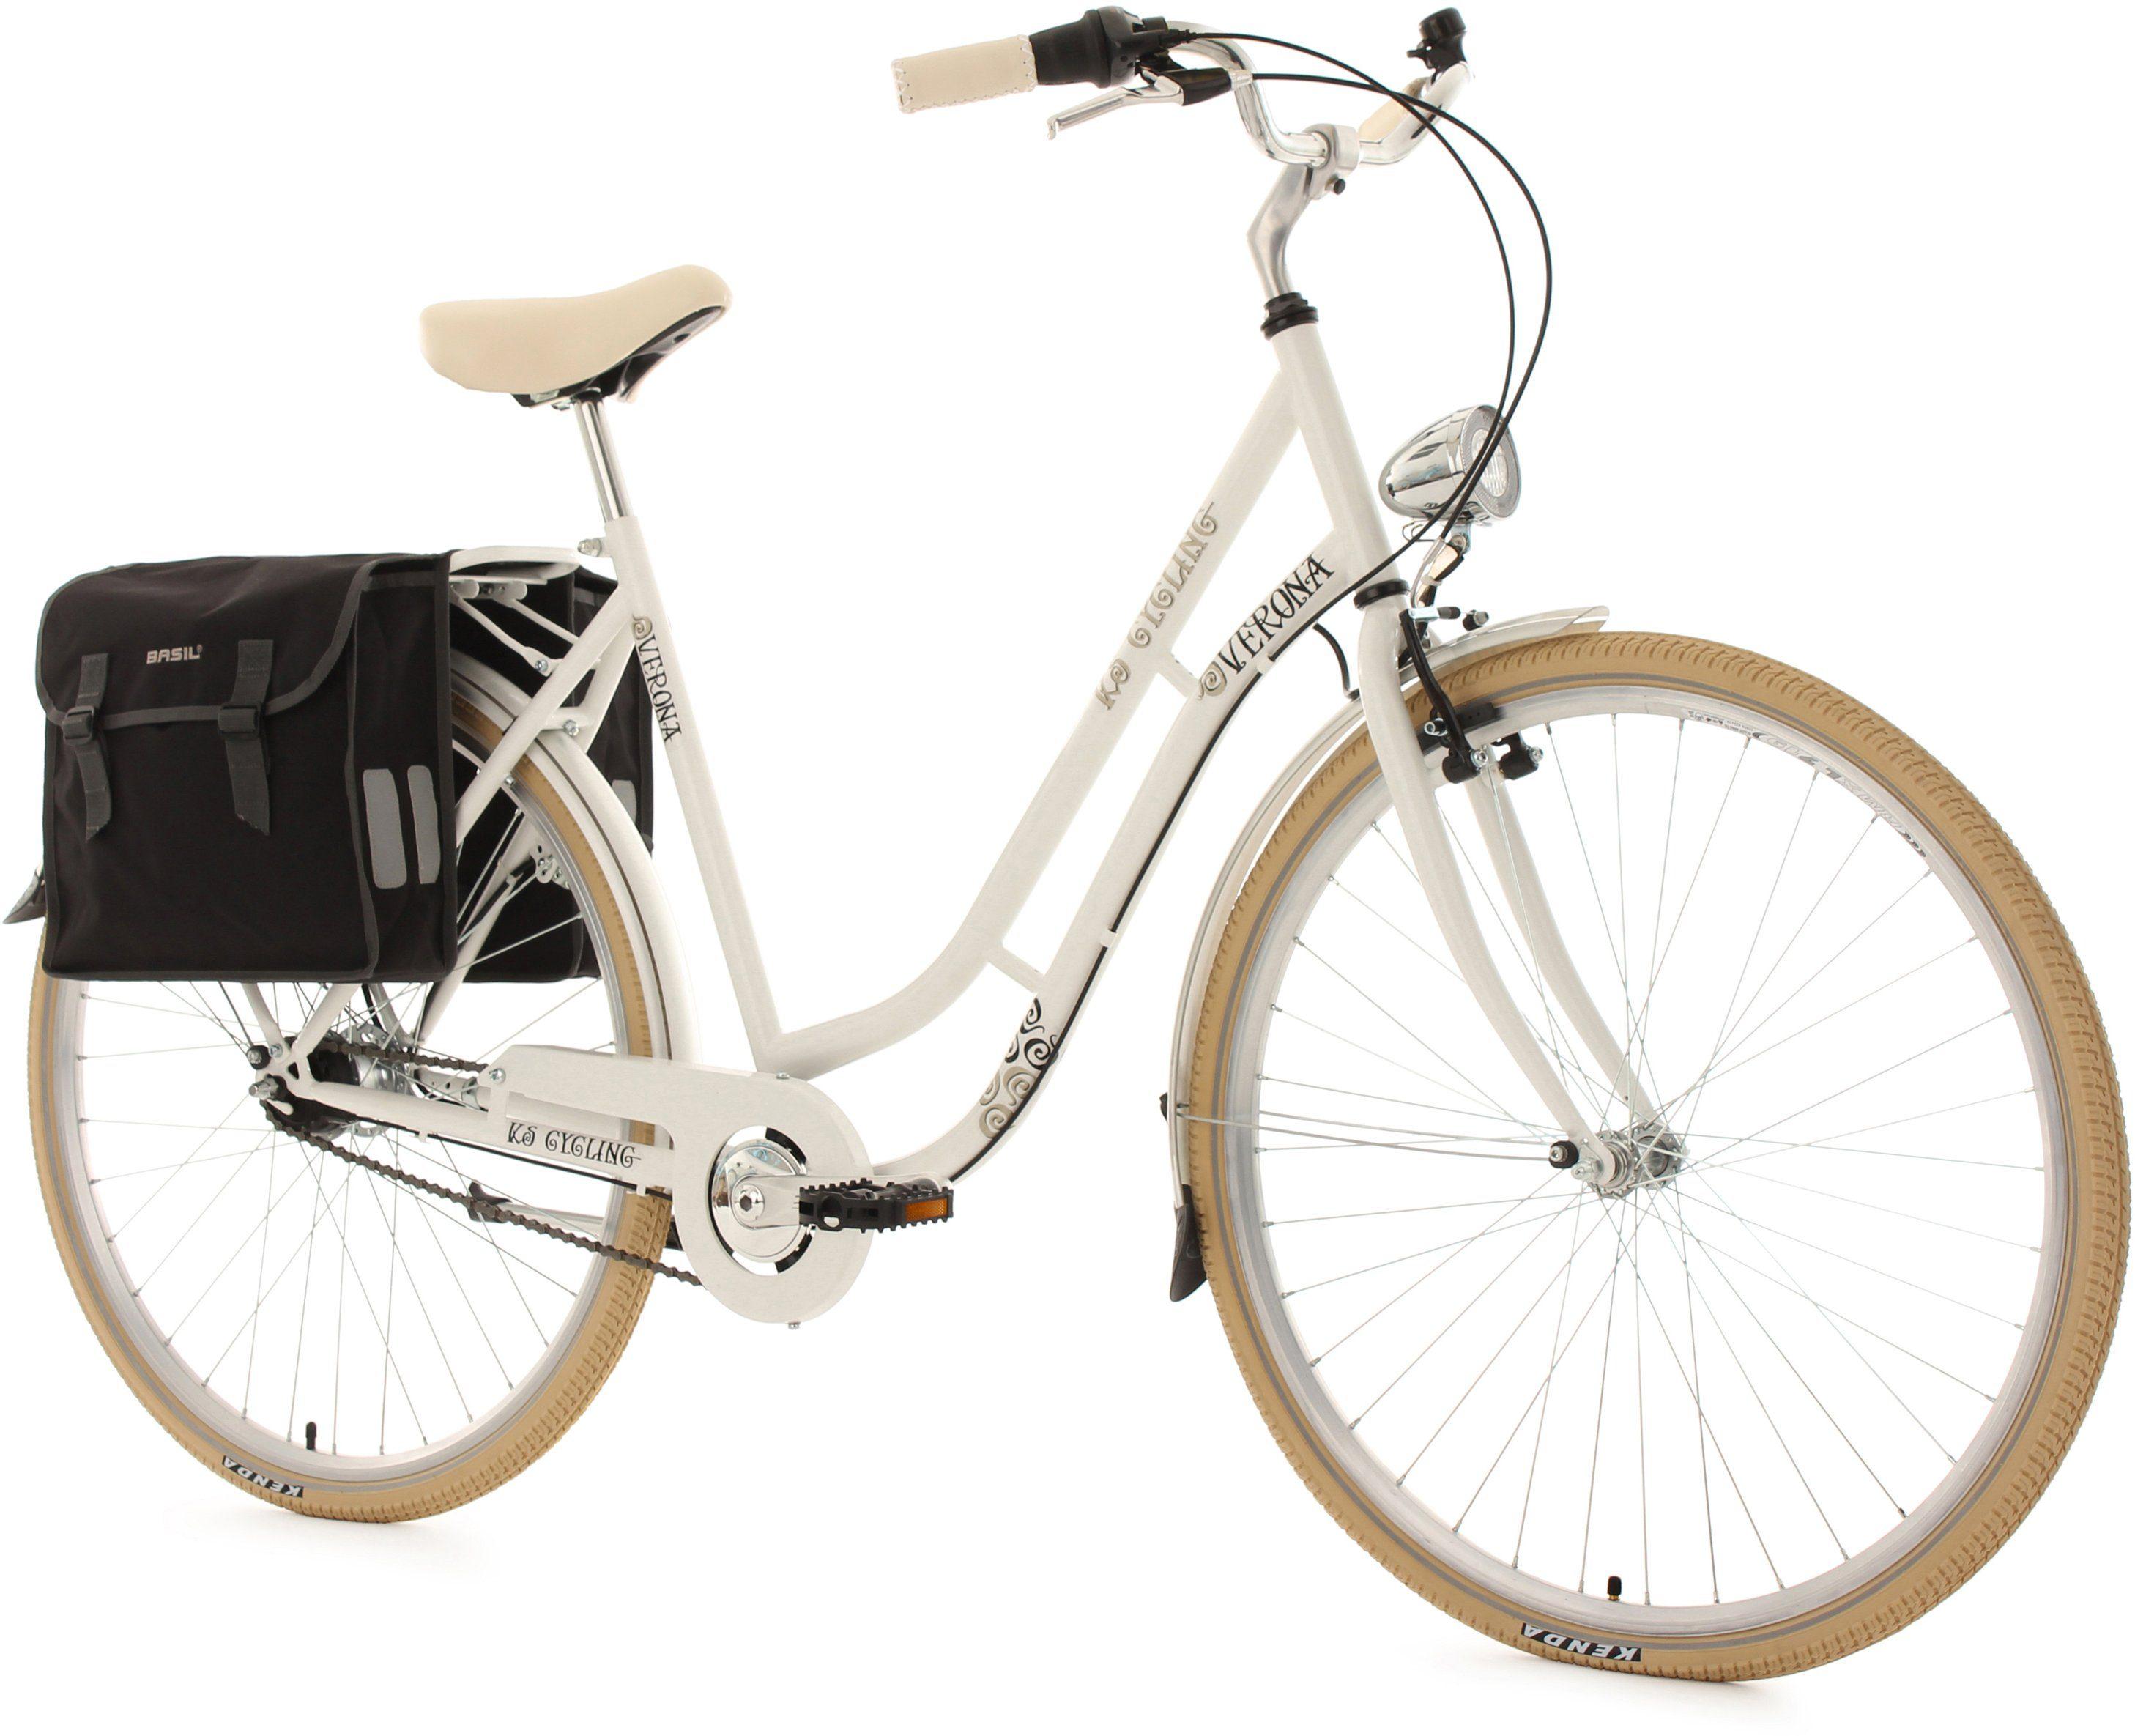 KS Cycling Damen-Cityrad, 28 Zoll, weiß, 7 Gang Shimano Nexus, inkl. Doppelpacktasche, »Verona«